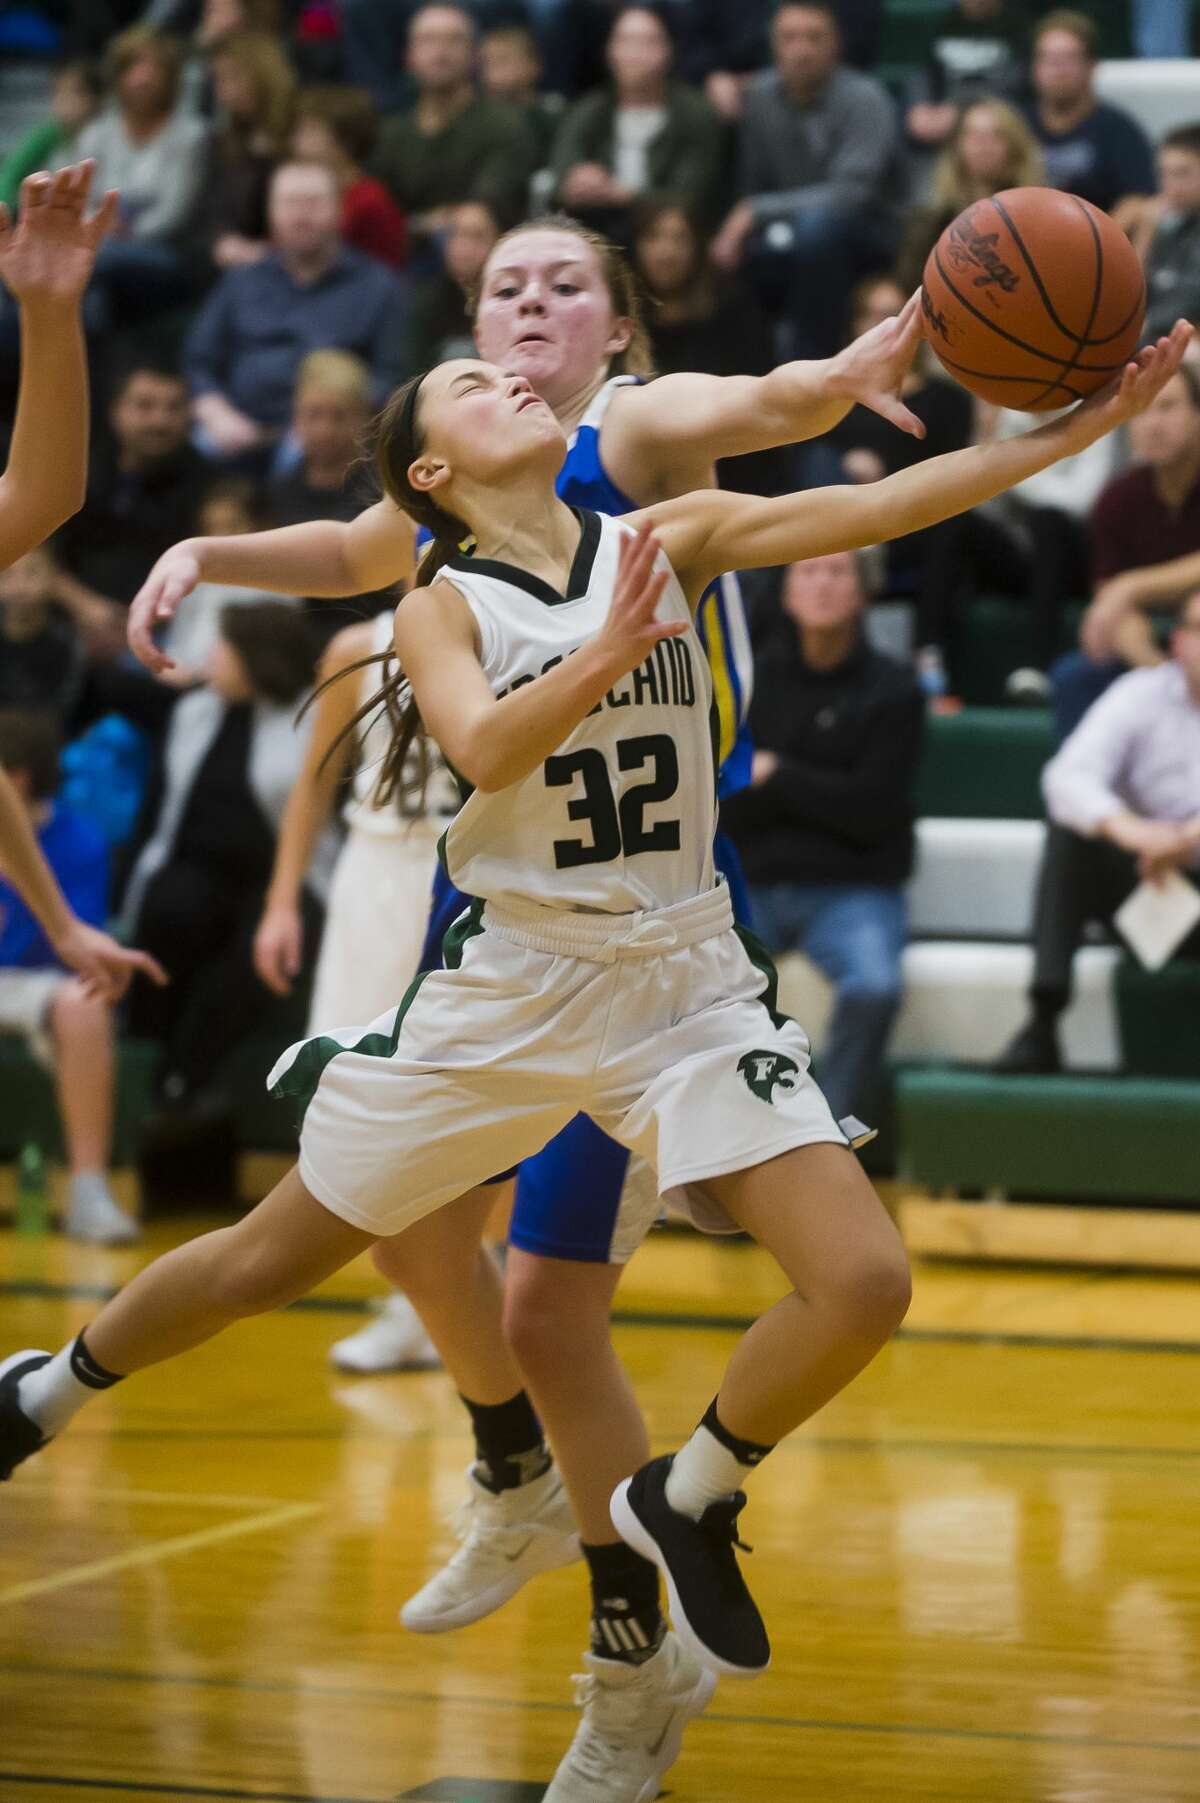 Freeland senior Kaylee Argyle takes a shot as Midland senior Maddie Barrie tries to block her during their game on Friday, Dec. 1, 2017 at Freeland High School. (Katy Kildee/kkildee@mdn.net)